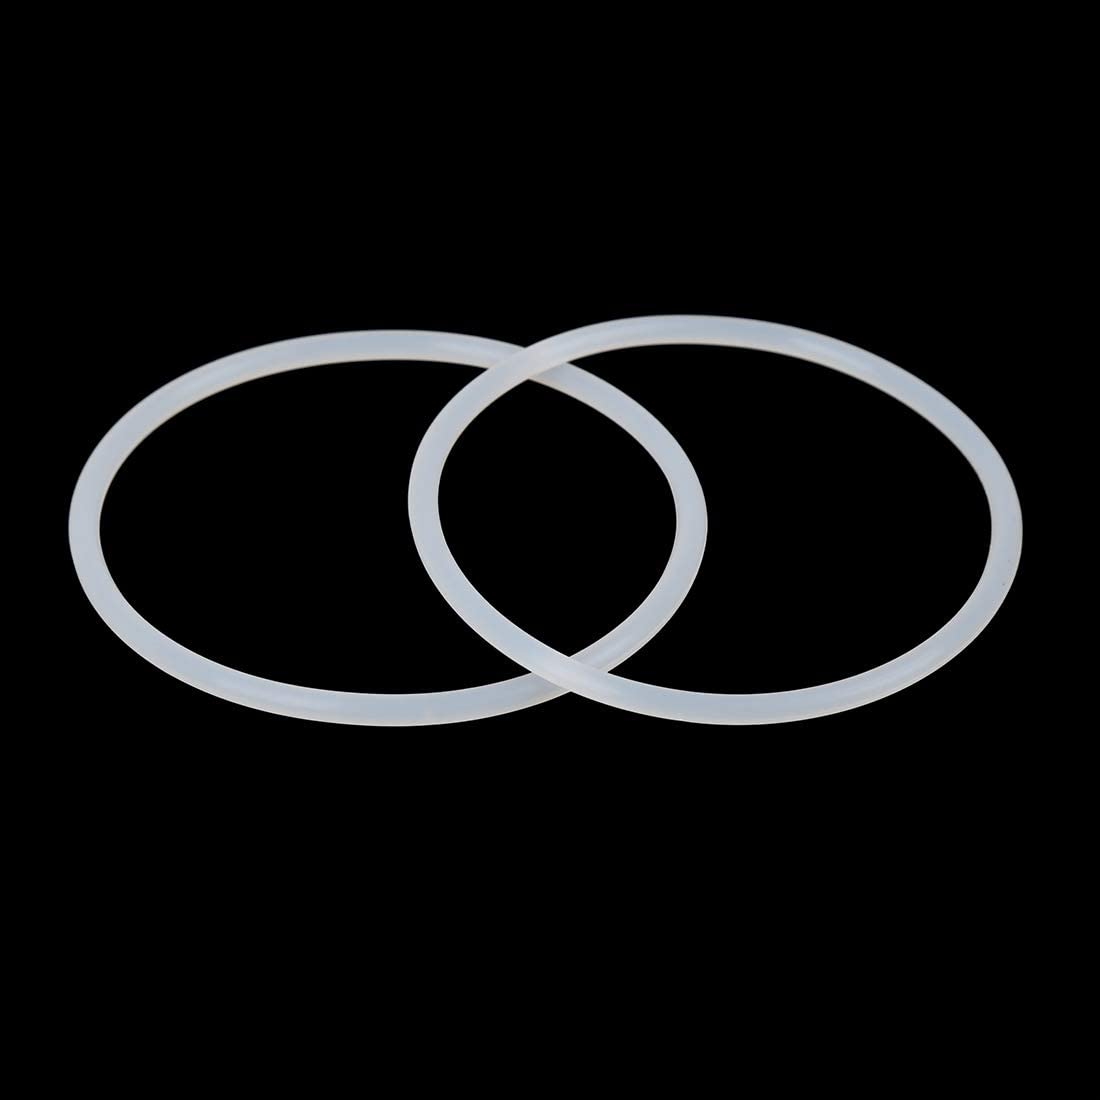 X AUTOHAUX 5St Silikon O-Ring Dichtungsscheibe f/ür Auto 75mm X 3.5mm wei/ß